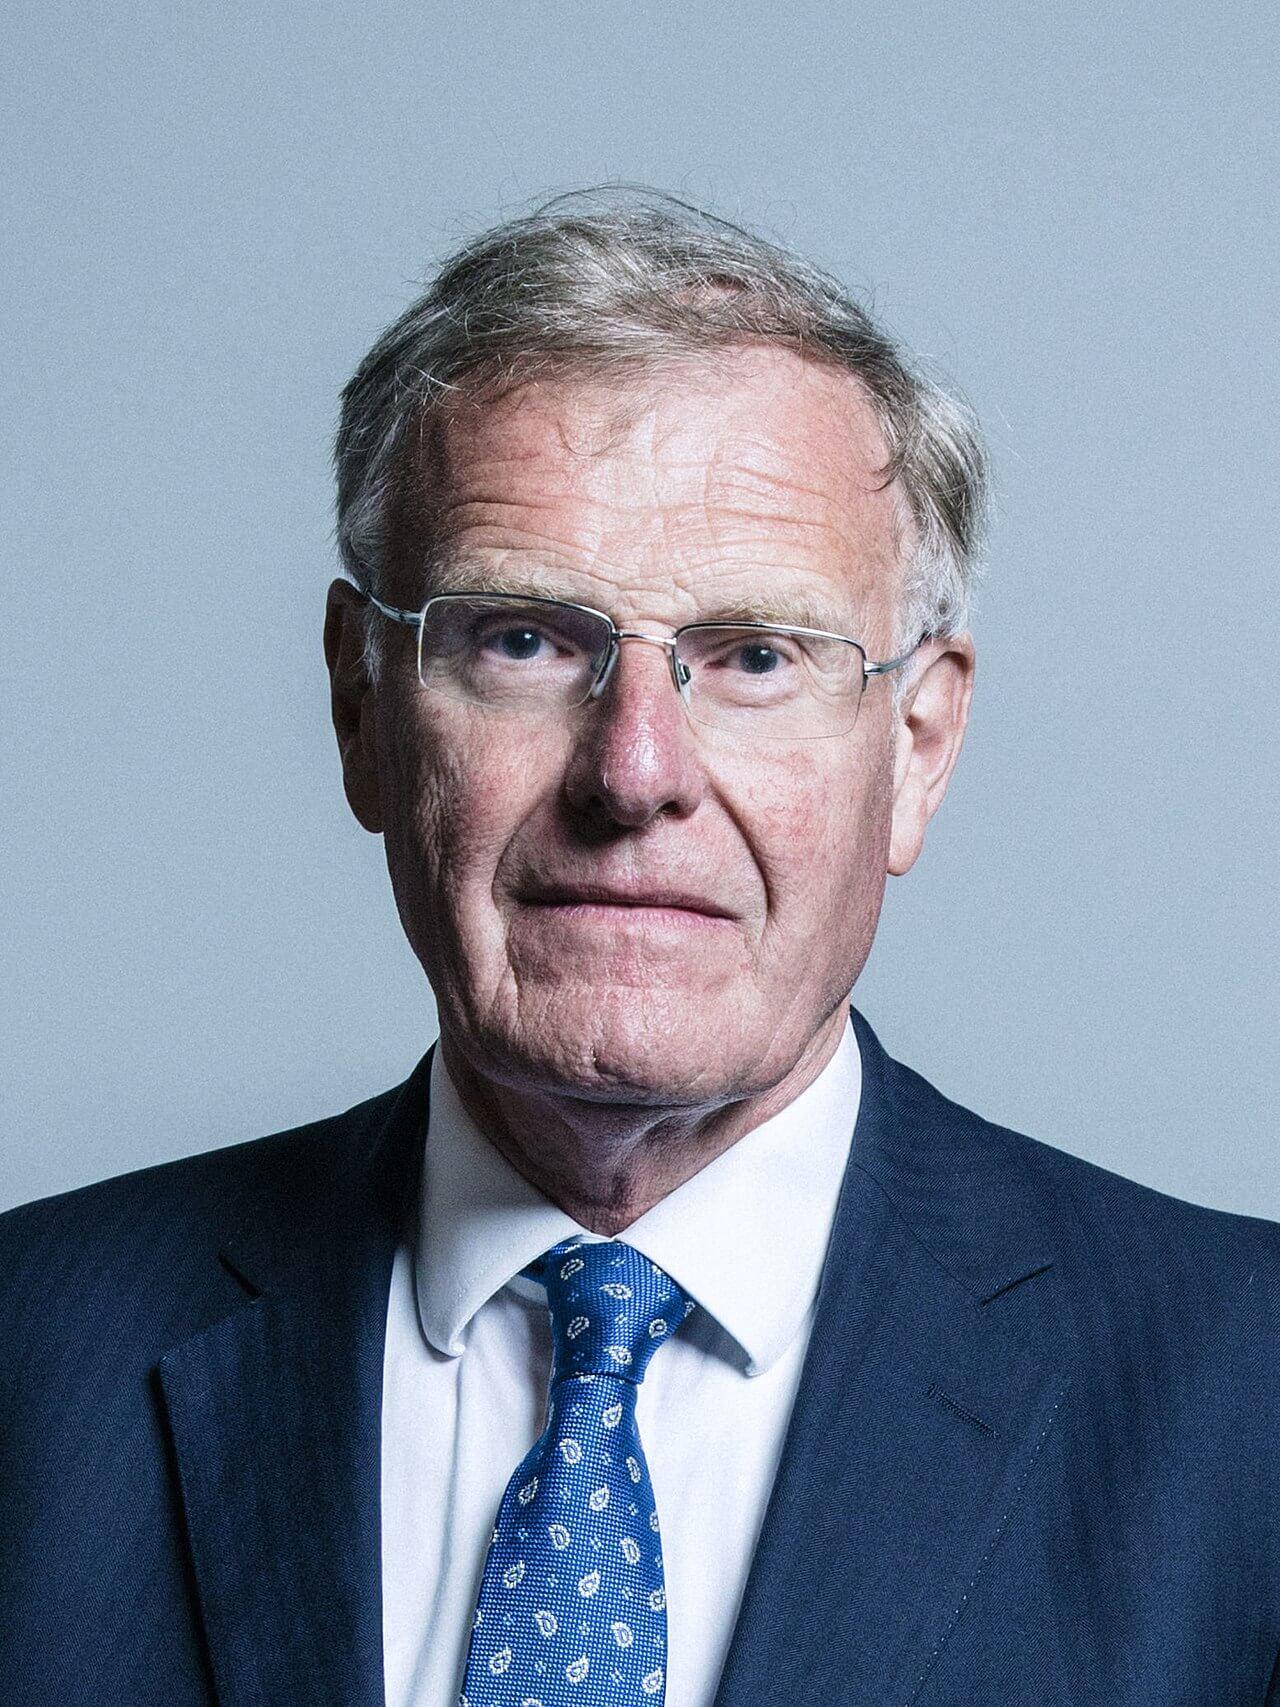 Conservative MP Sir Christopher Chode